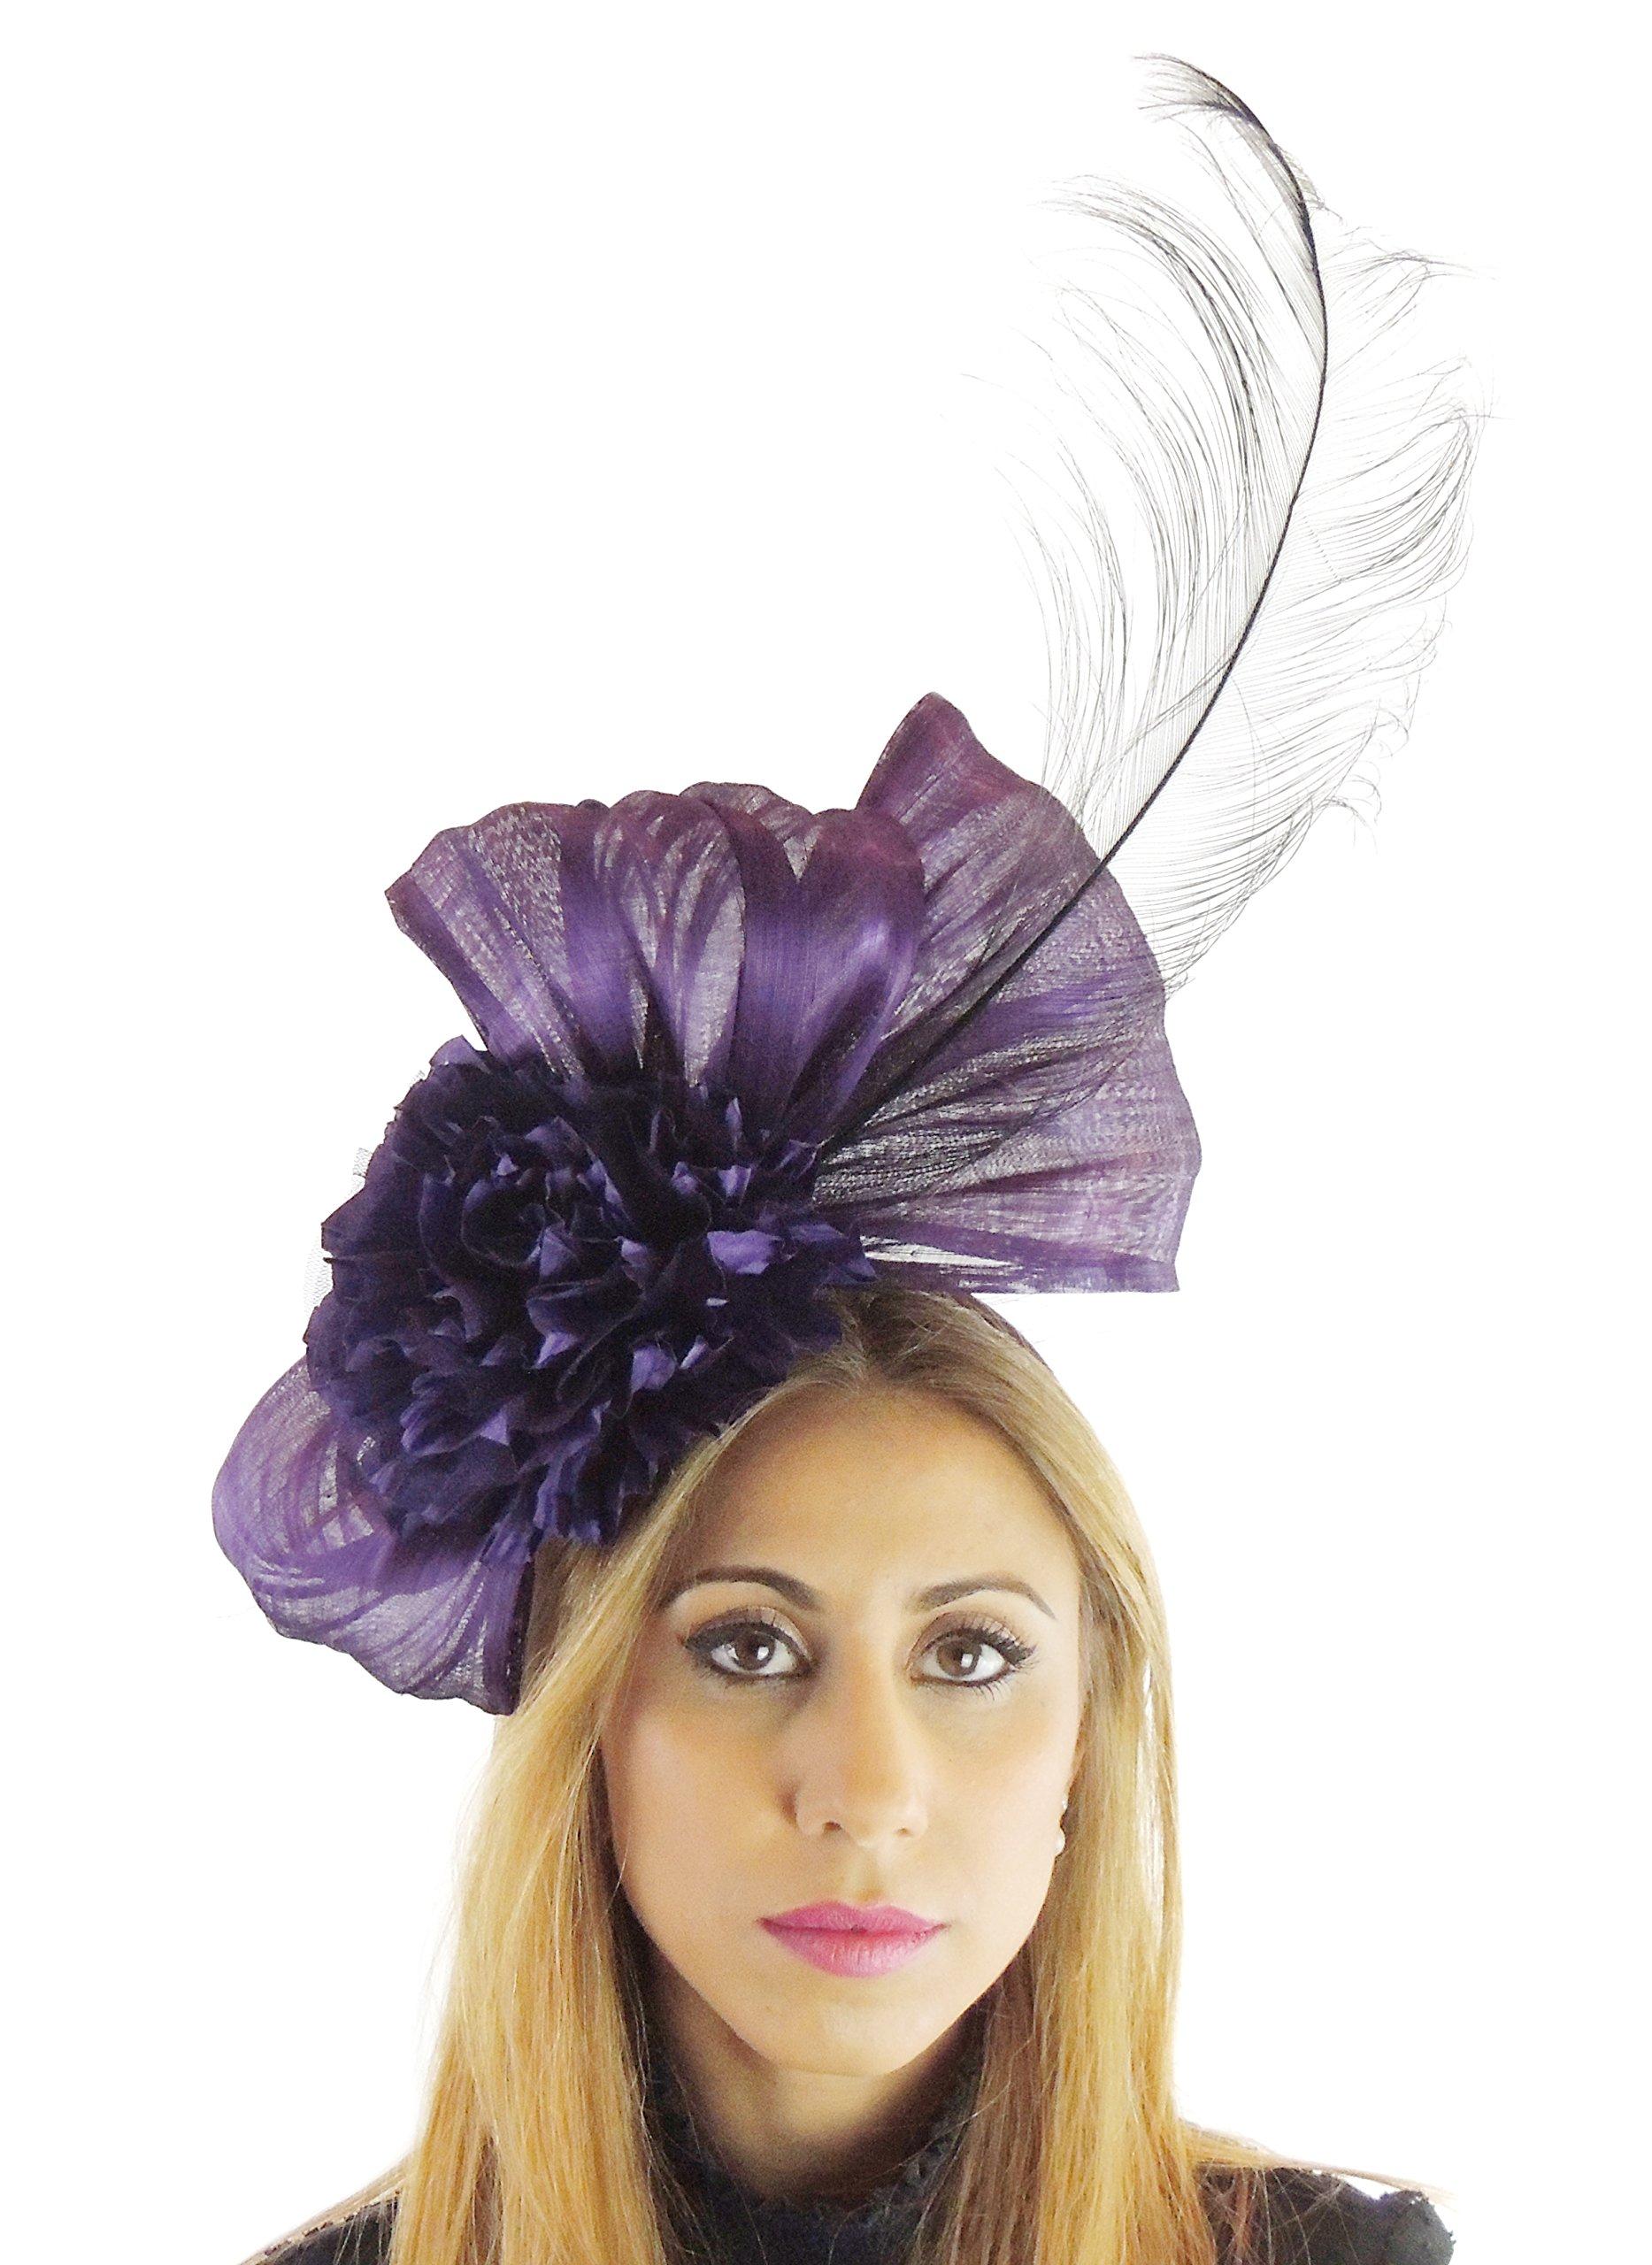 Hats By Cressida Silk Sinamay & Silk Flower Elegant Ladies Ascot Wedding Fascinator Hat Aubergine by Hats By Cressida